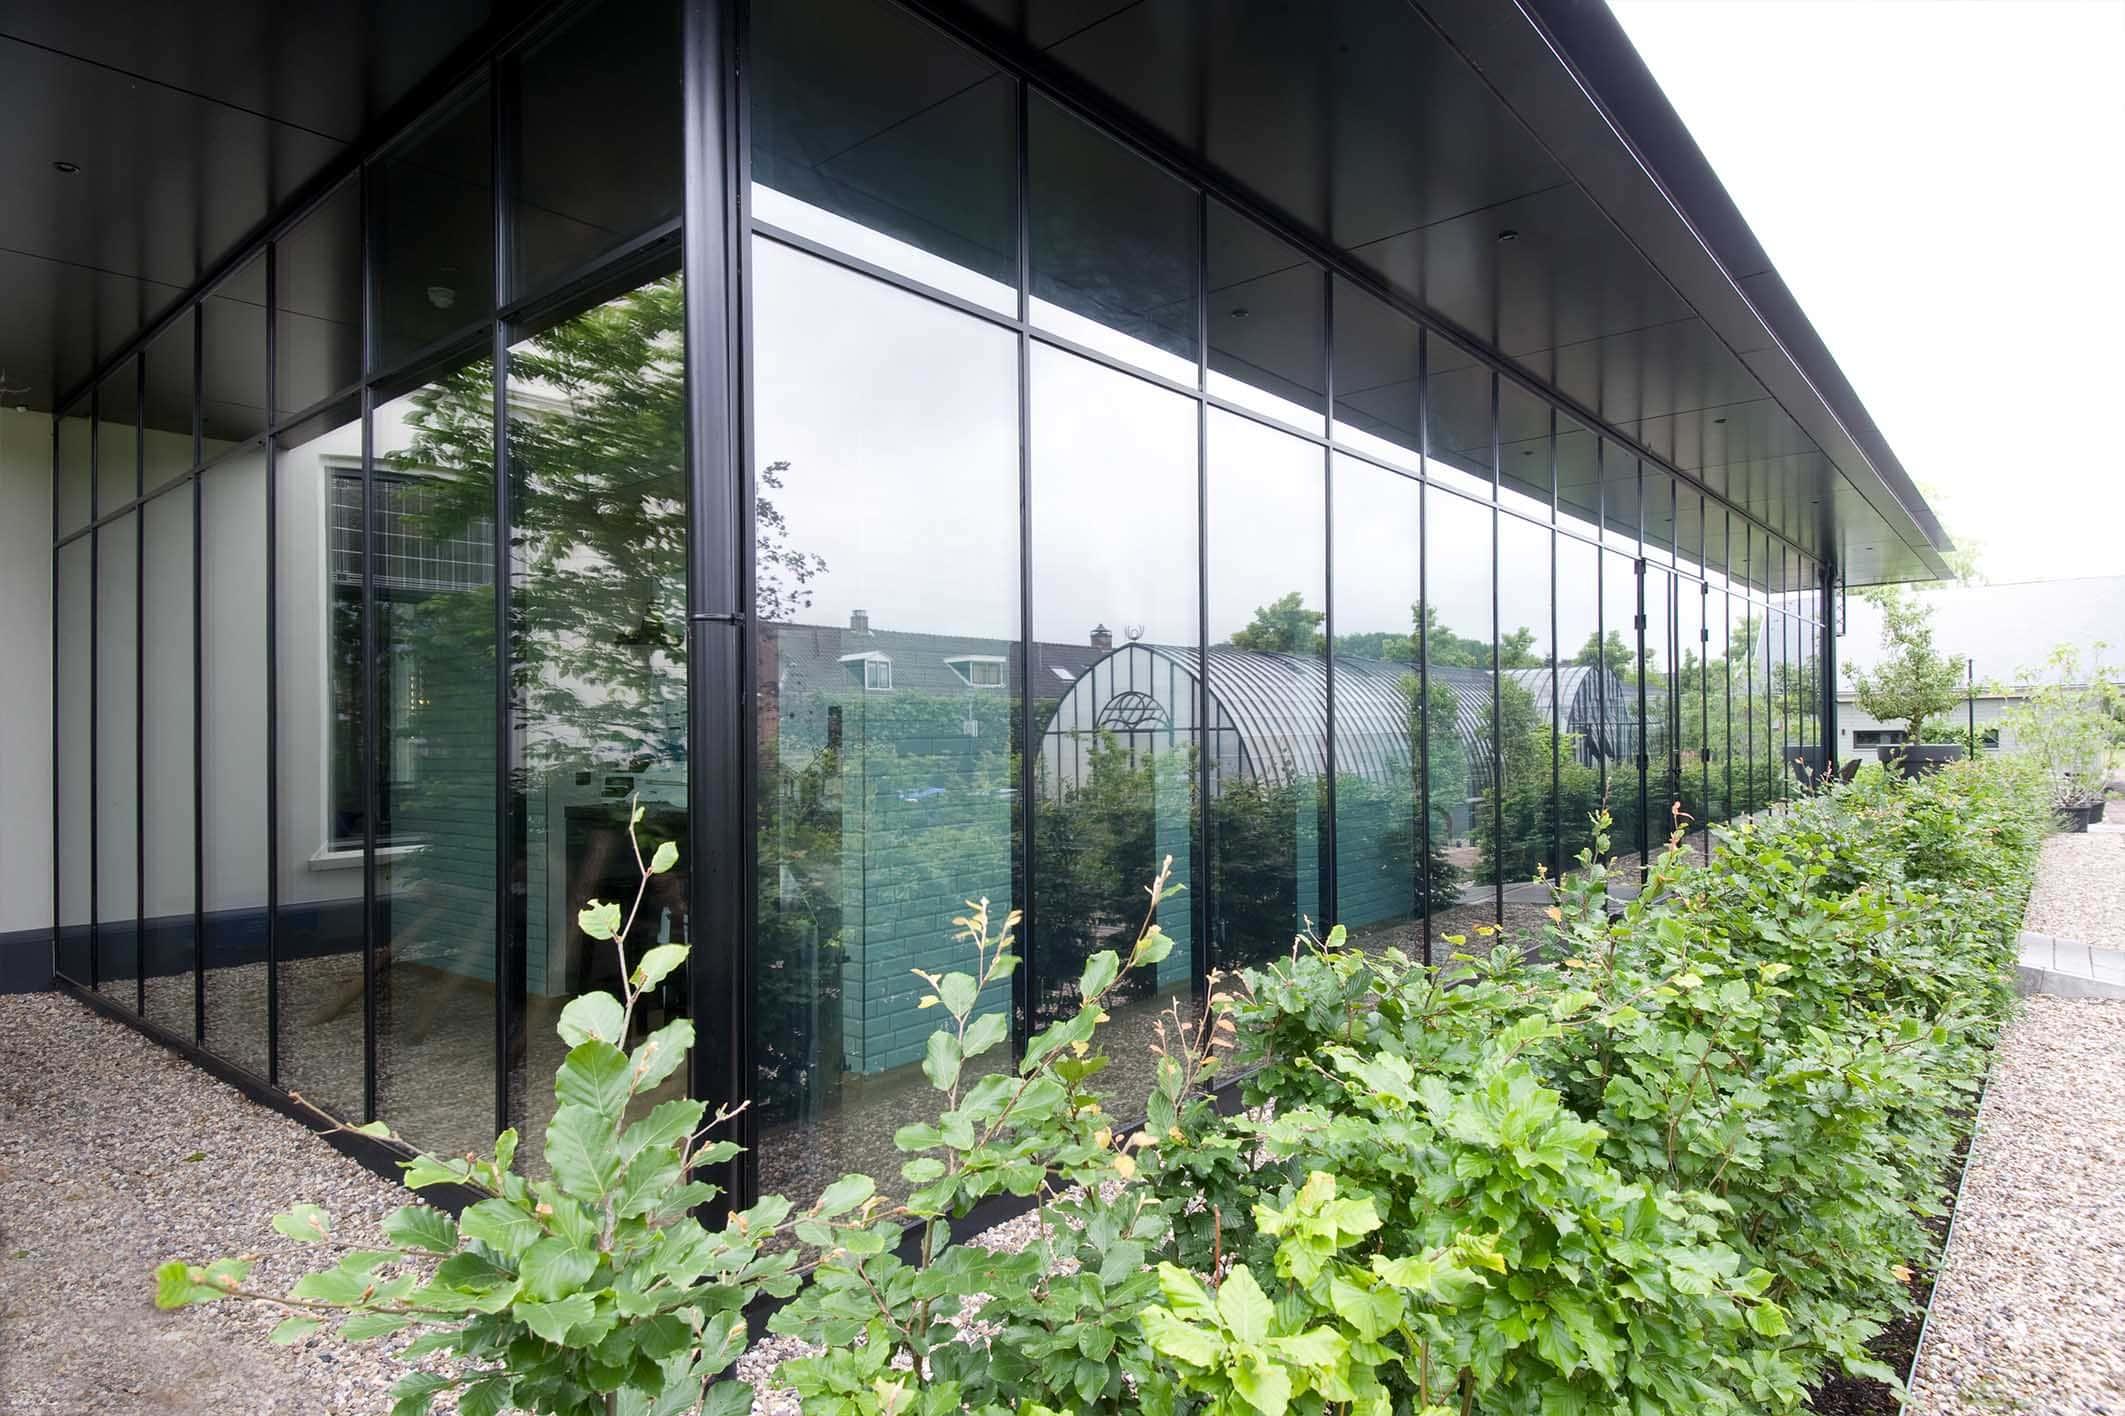 modern restaurant with steel framed glass walls